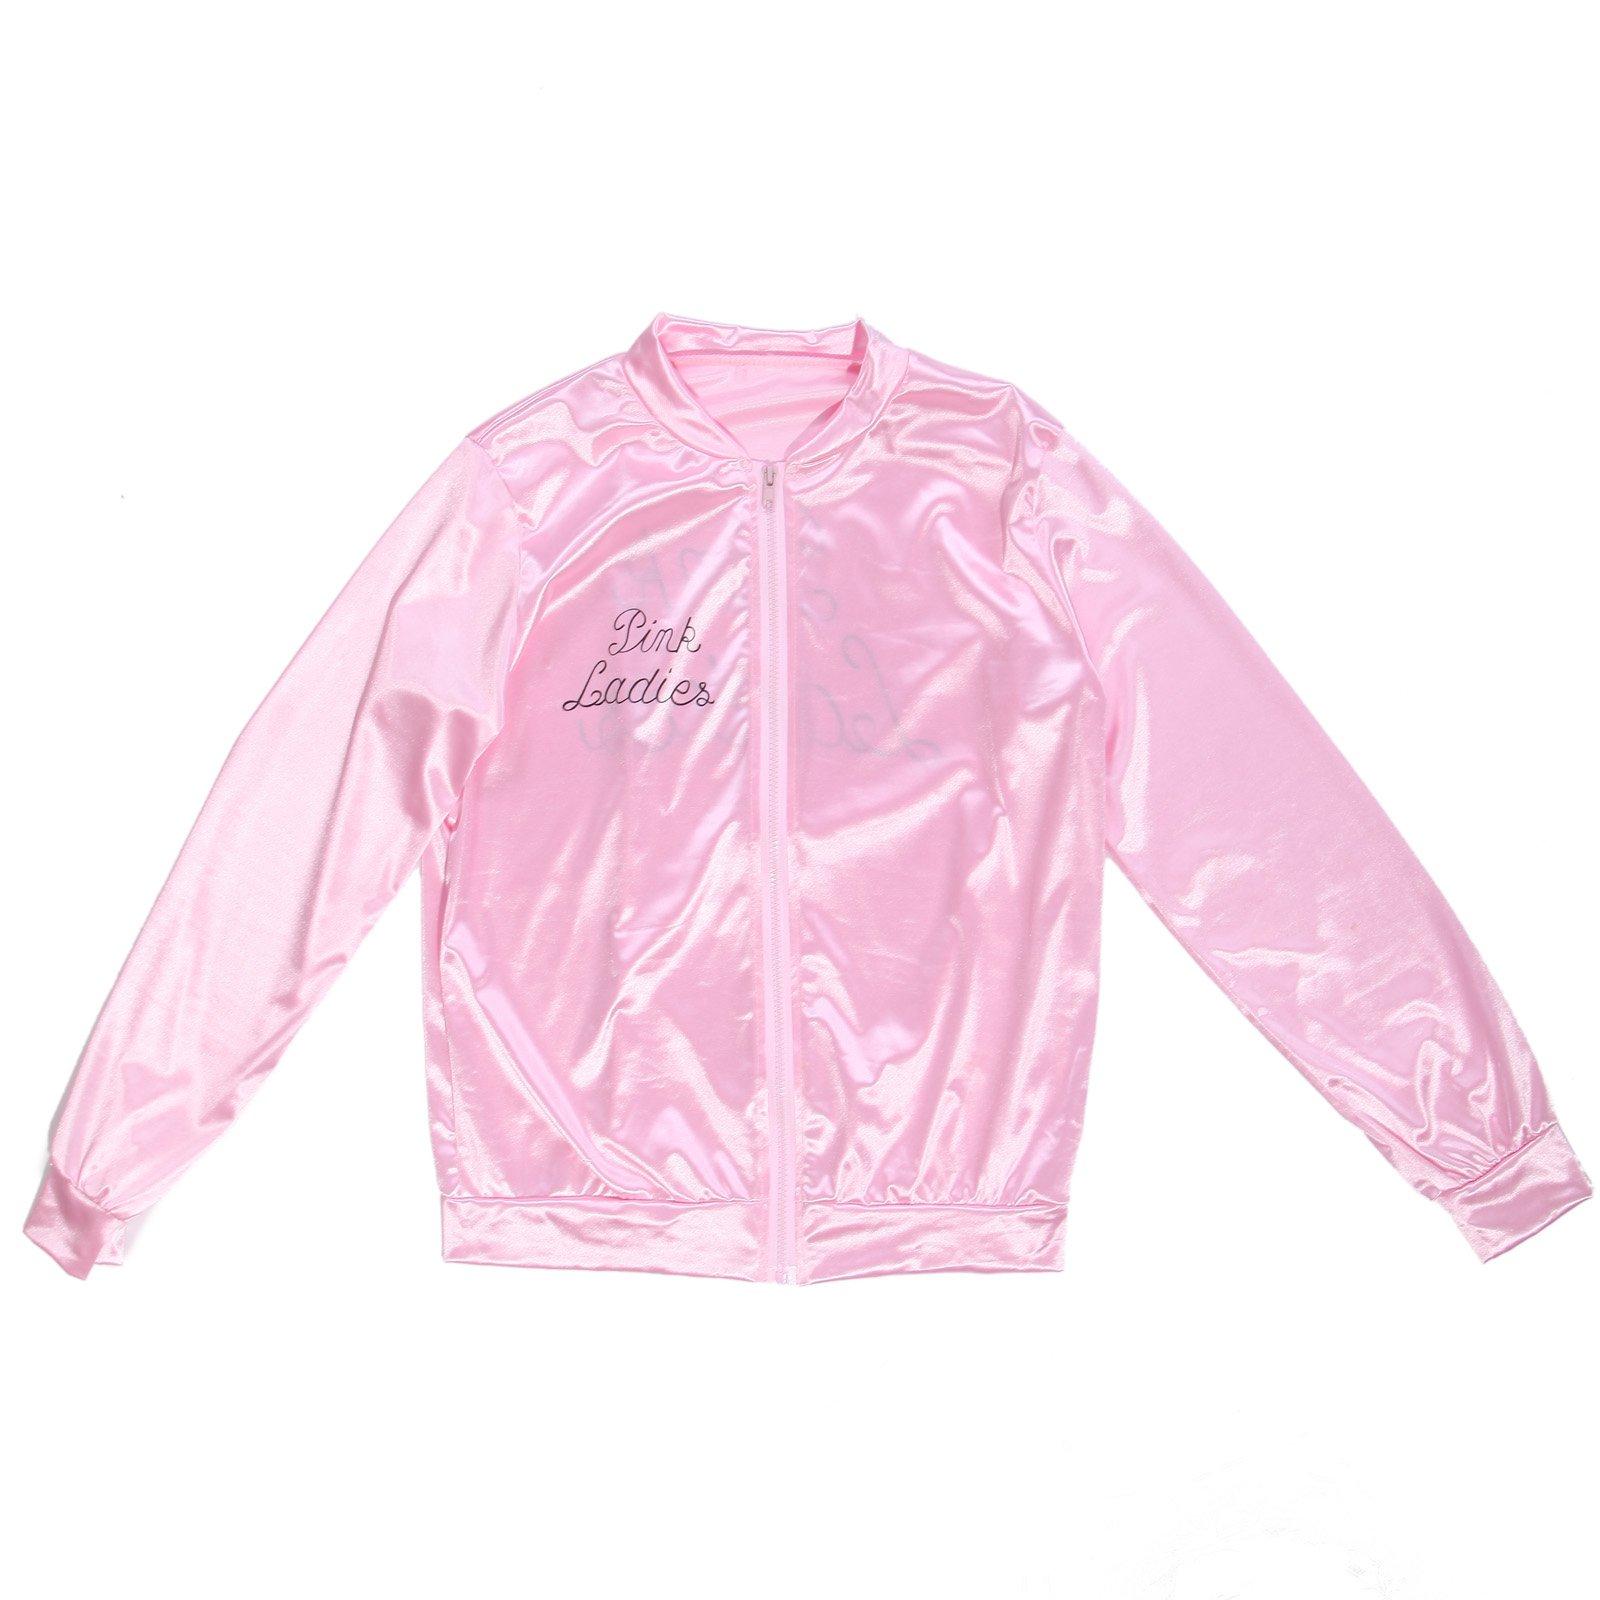 Fashoutlet Retro 50s Grease Pink Lady Sweetie Jacket Hen Party Dance Costume Fancy Dress by Fashoutlet